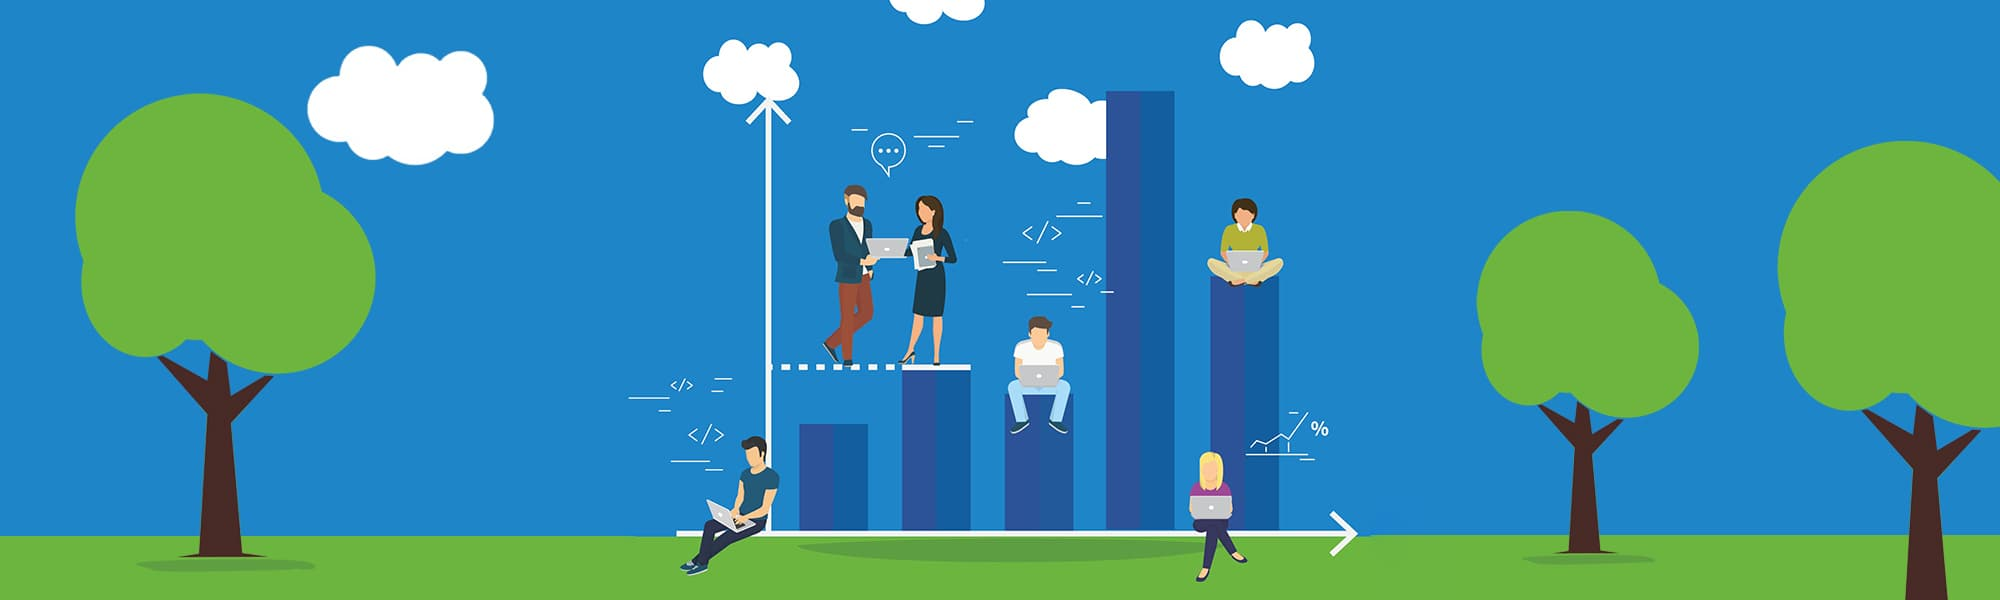 global sepsis alliance advance people sitting on diagram blue sky clouds wide.jpg